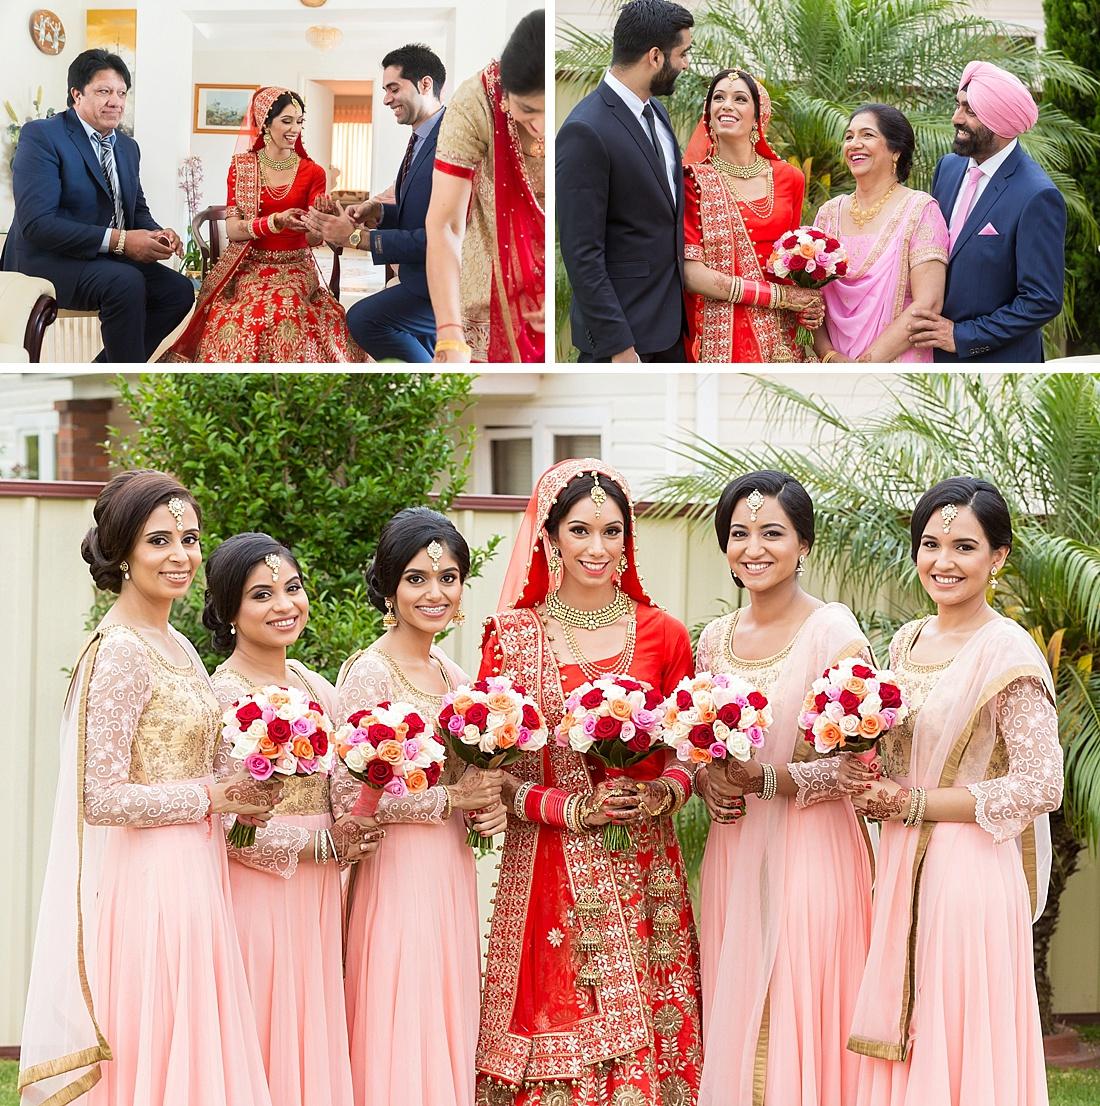 Sikh Wedding Food: Parklea Gurudwara